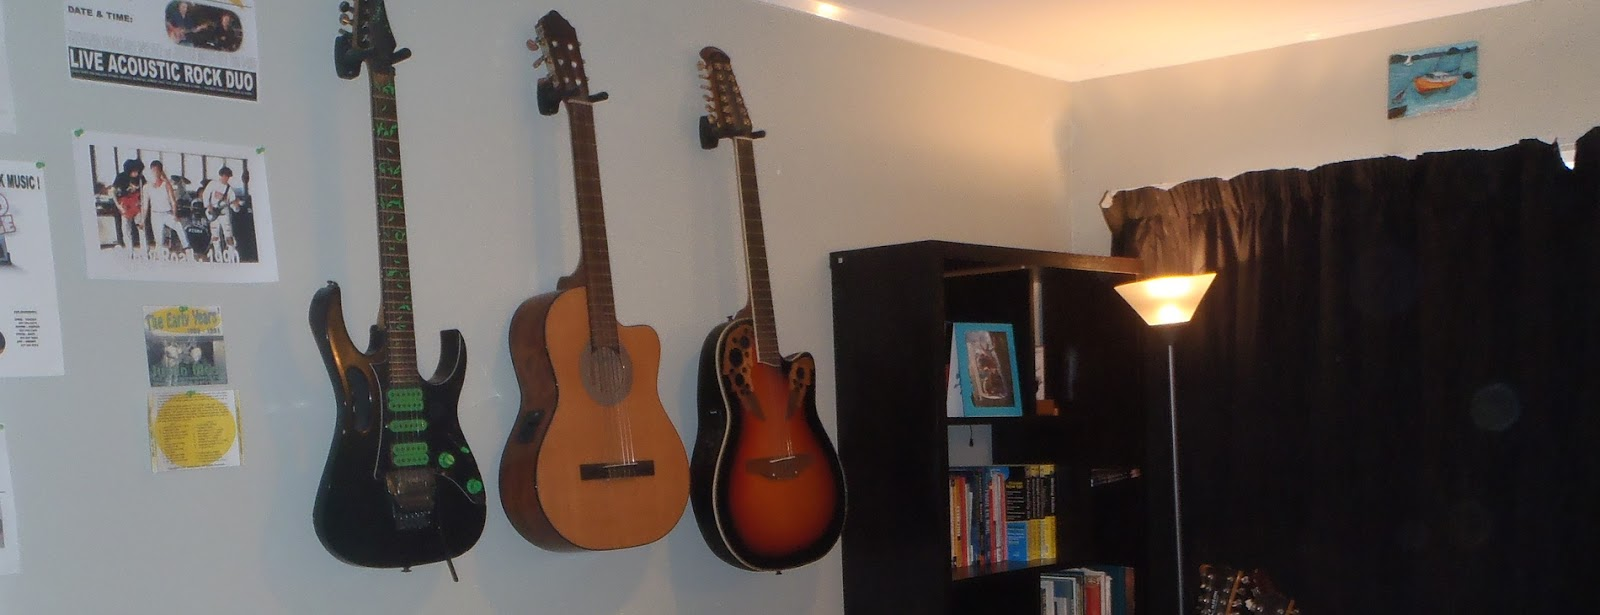 guitar_wall.jpg